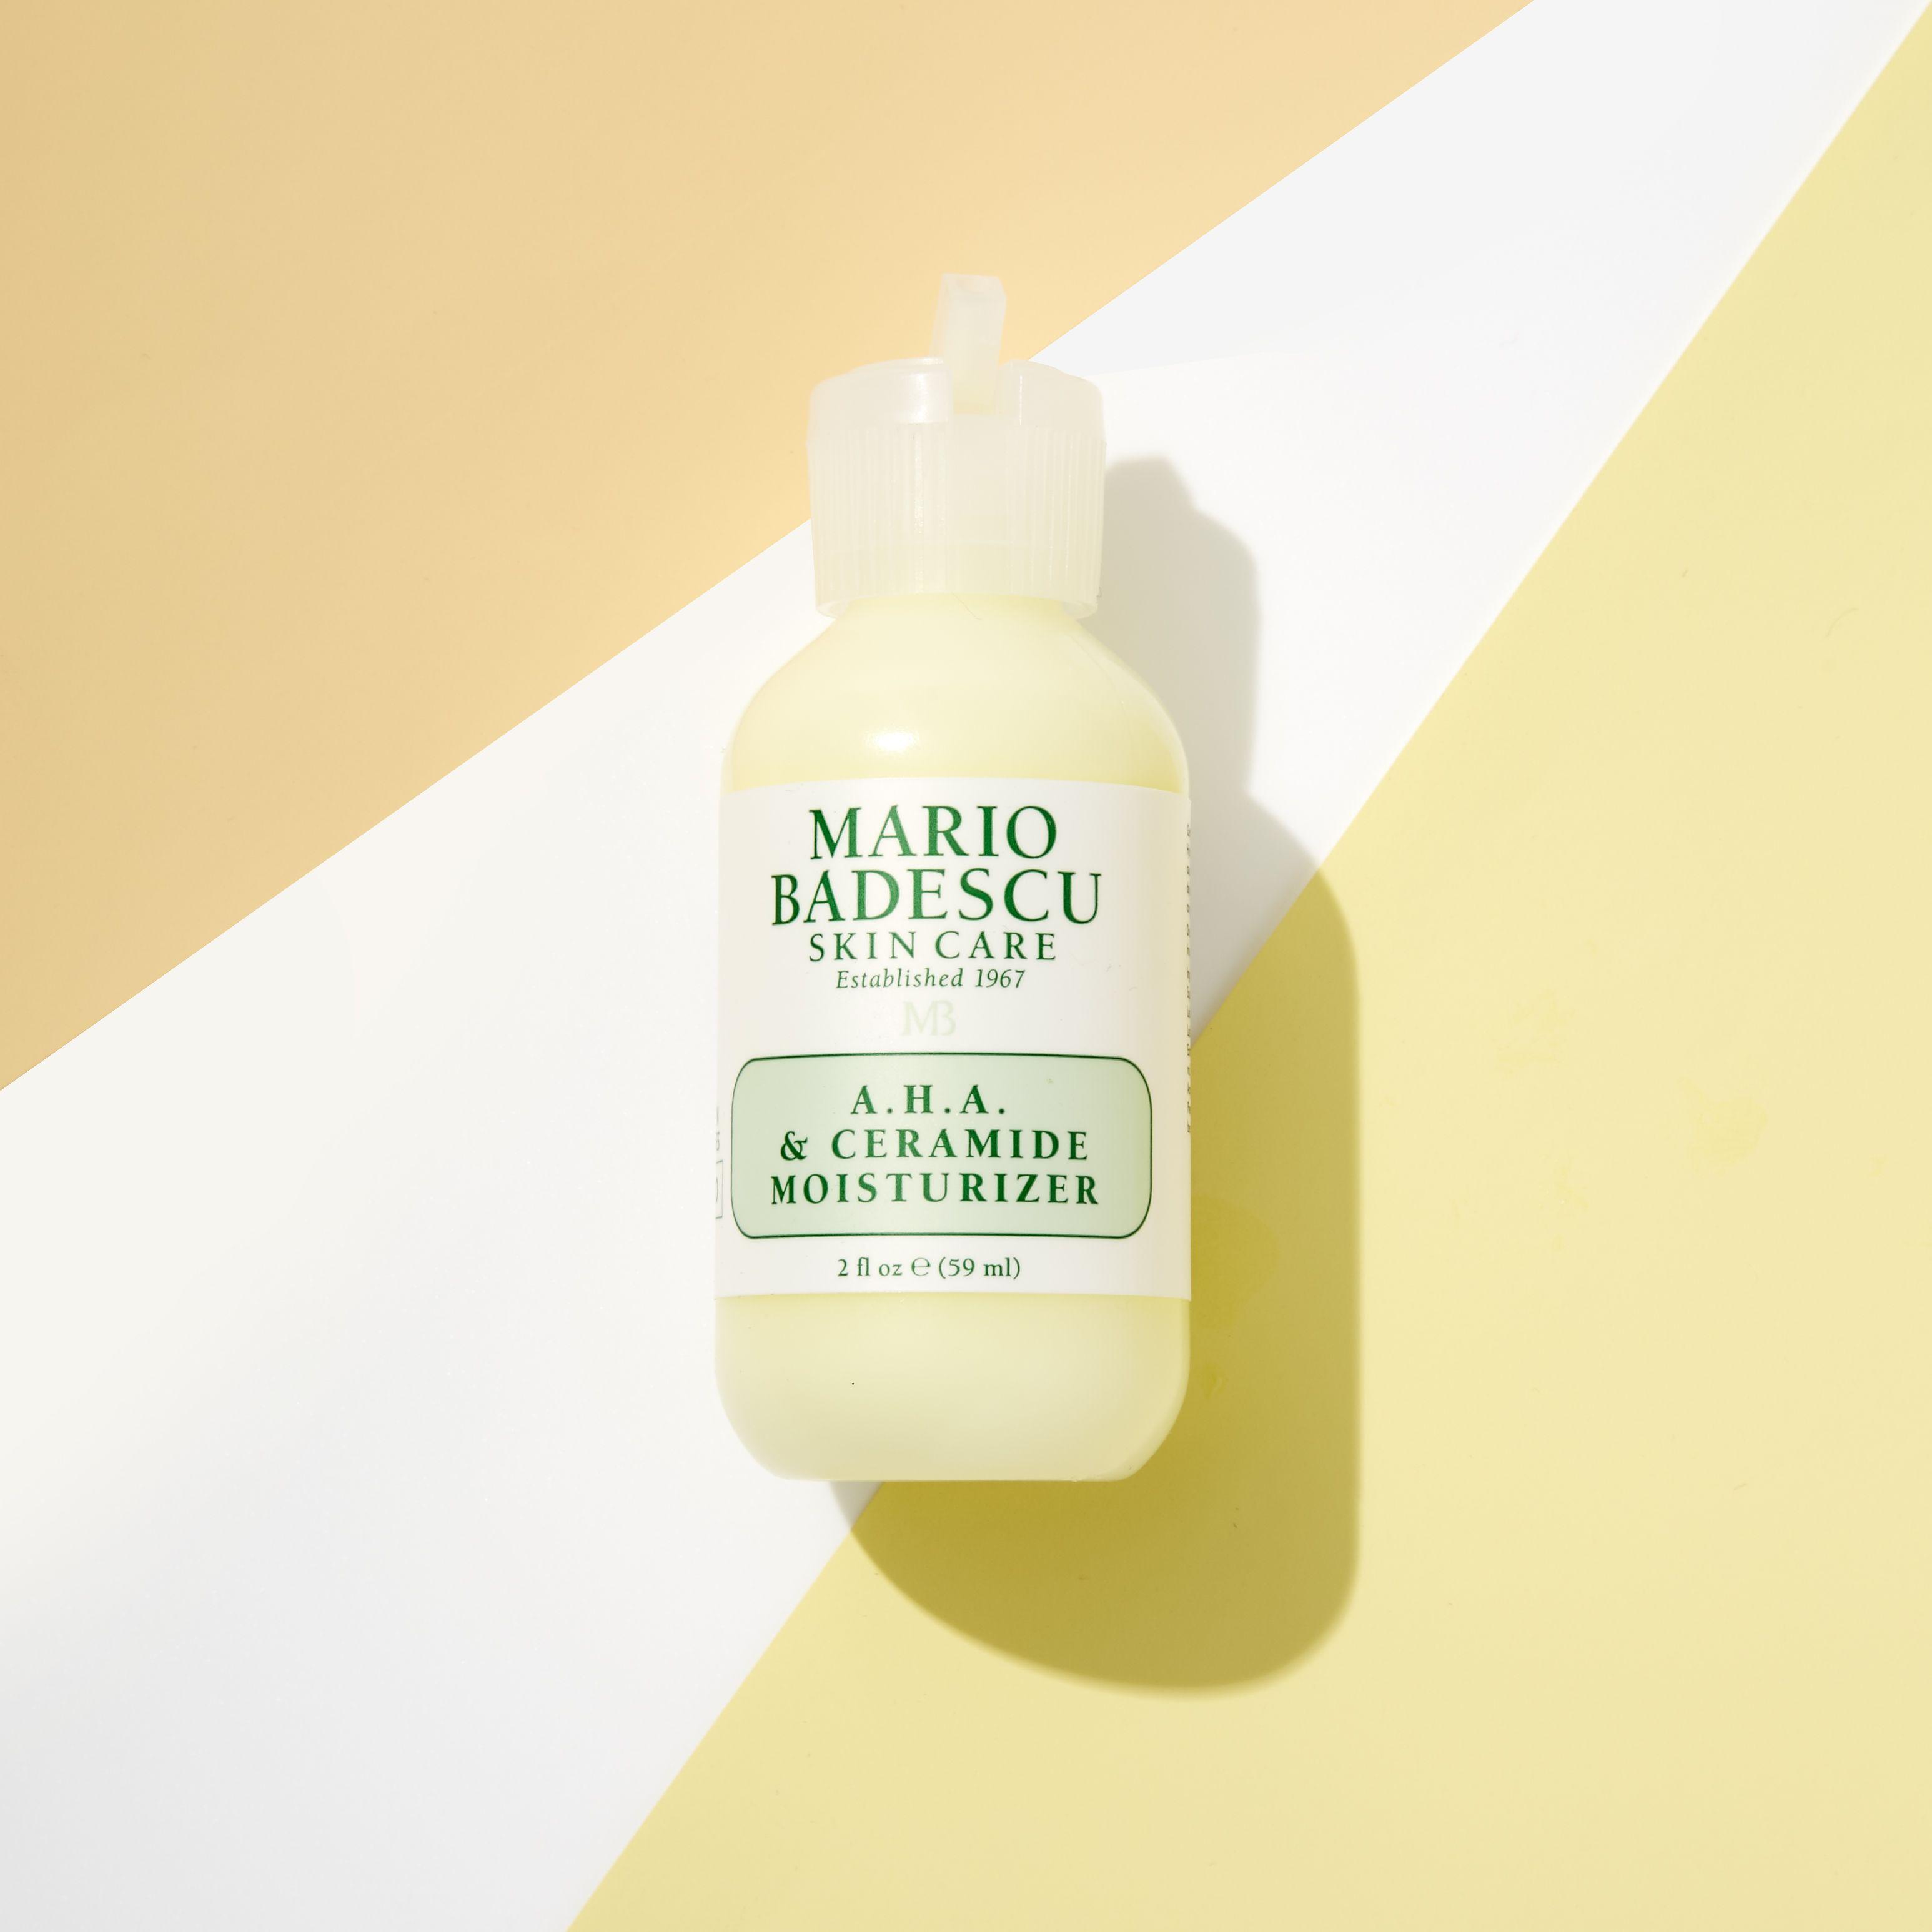 A H A Ceramide Moisturizer Beauty Skin Beauty Tips For Skin Beauty Skin Care